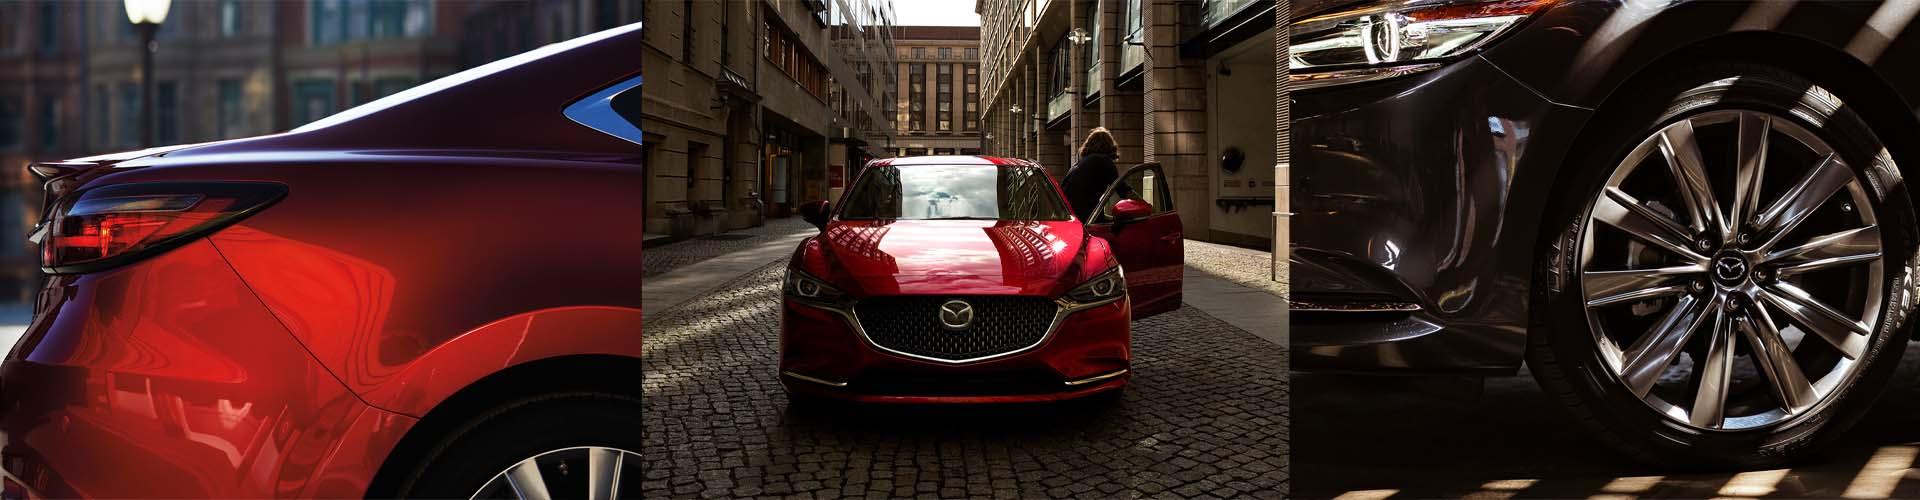 2019 Mazda6 exterior